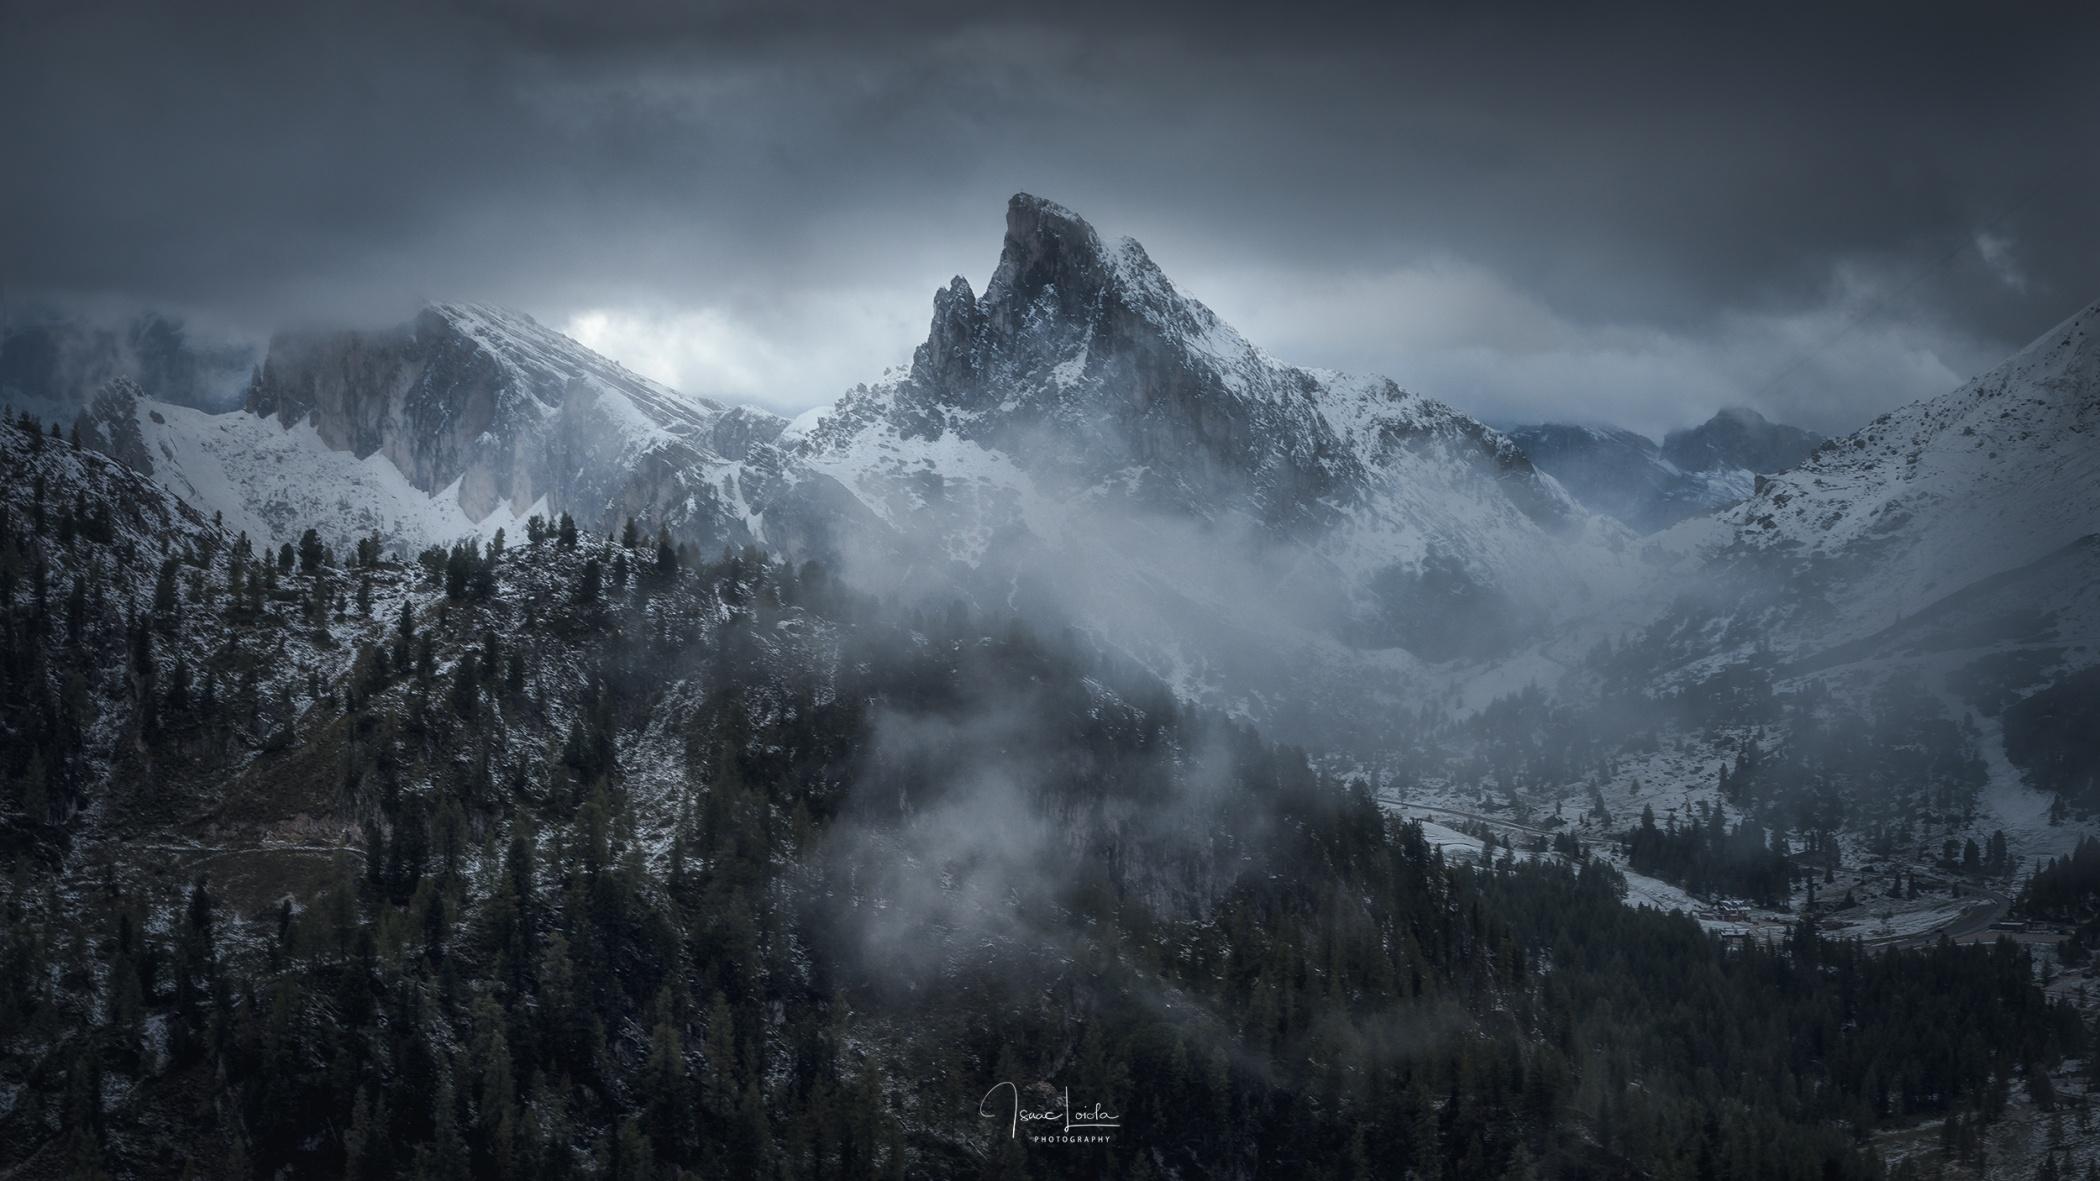 Sass de Stria - Mountain lights - Isaac Loiola, Photography